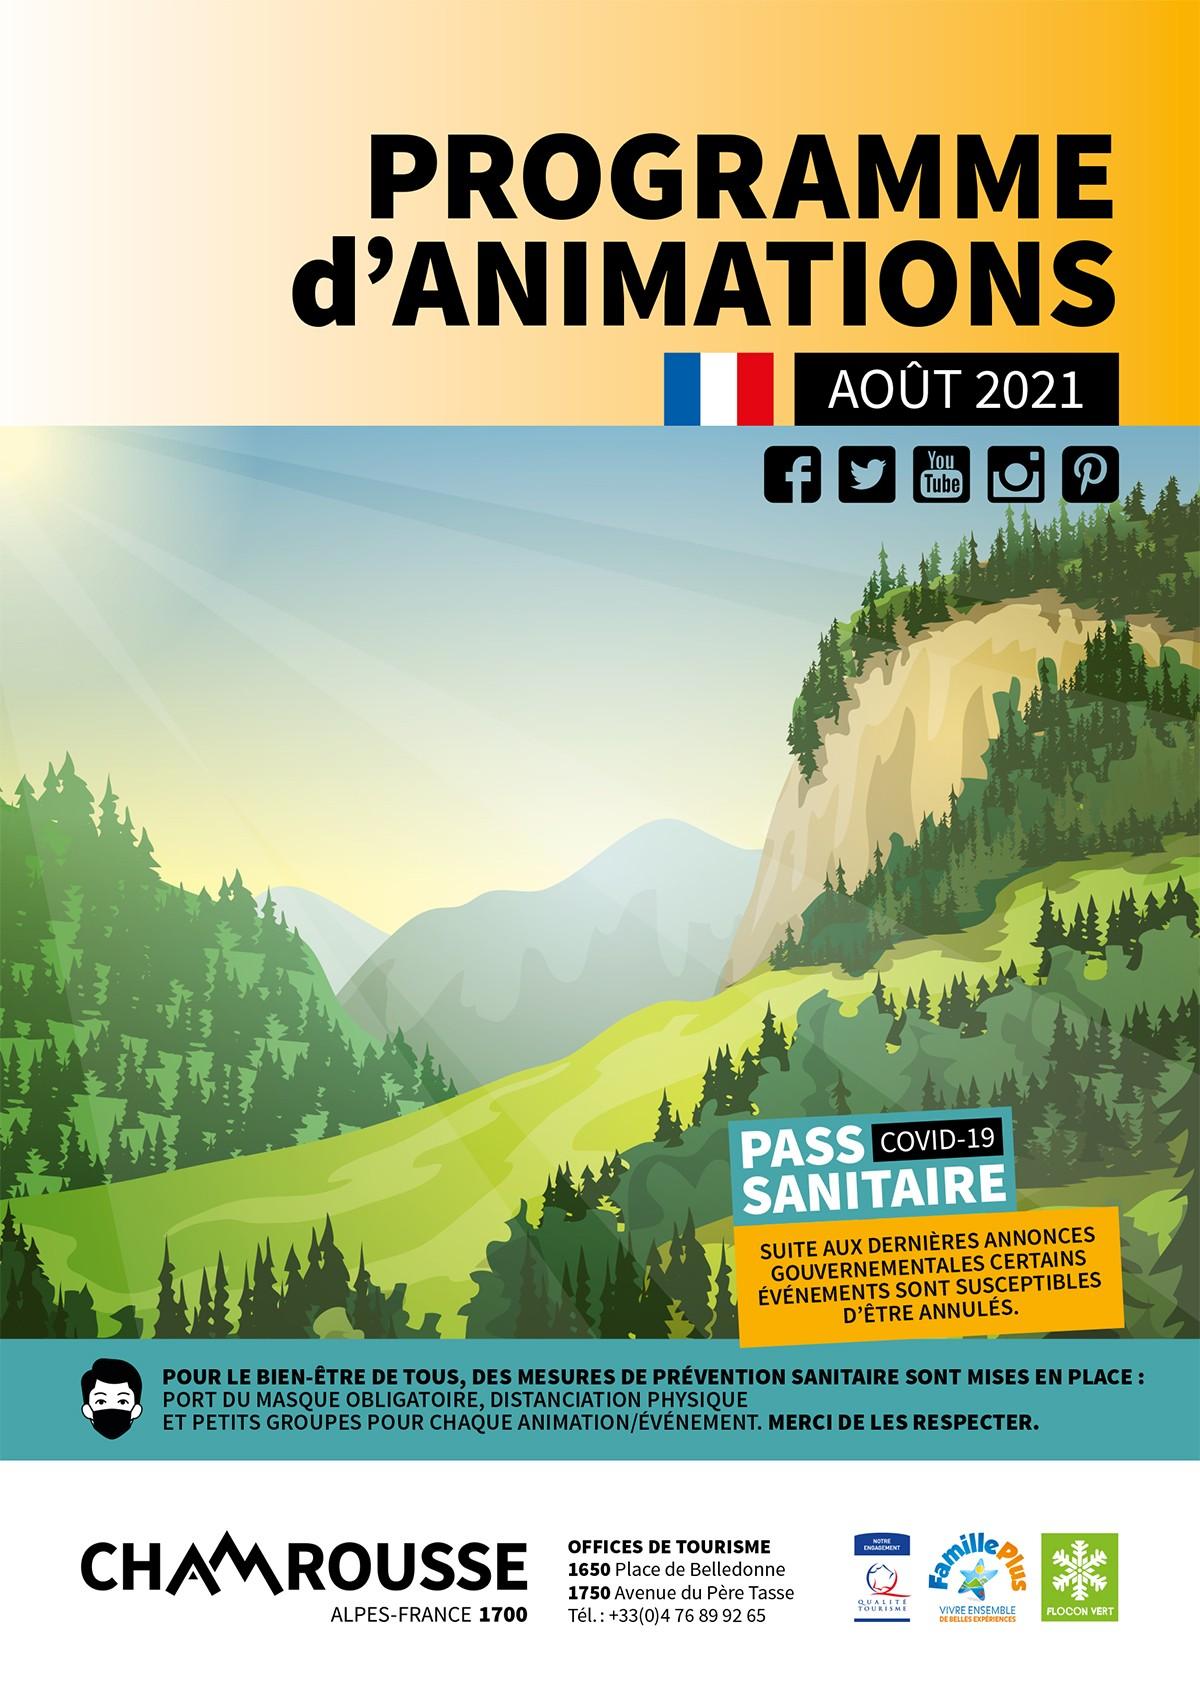 Chamrousse programme animation évènement août 2021 station montagne grenoble isère alpes france